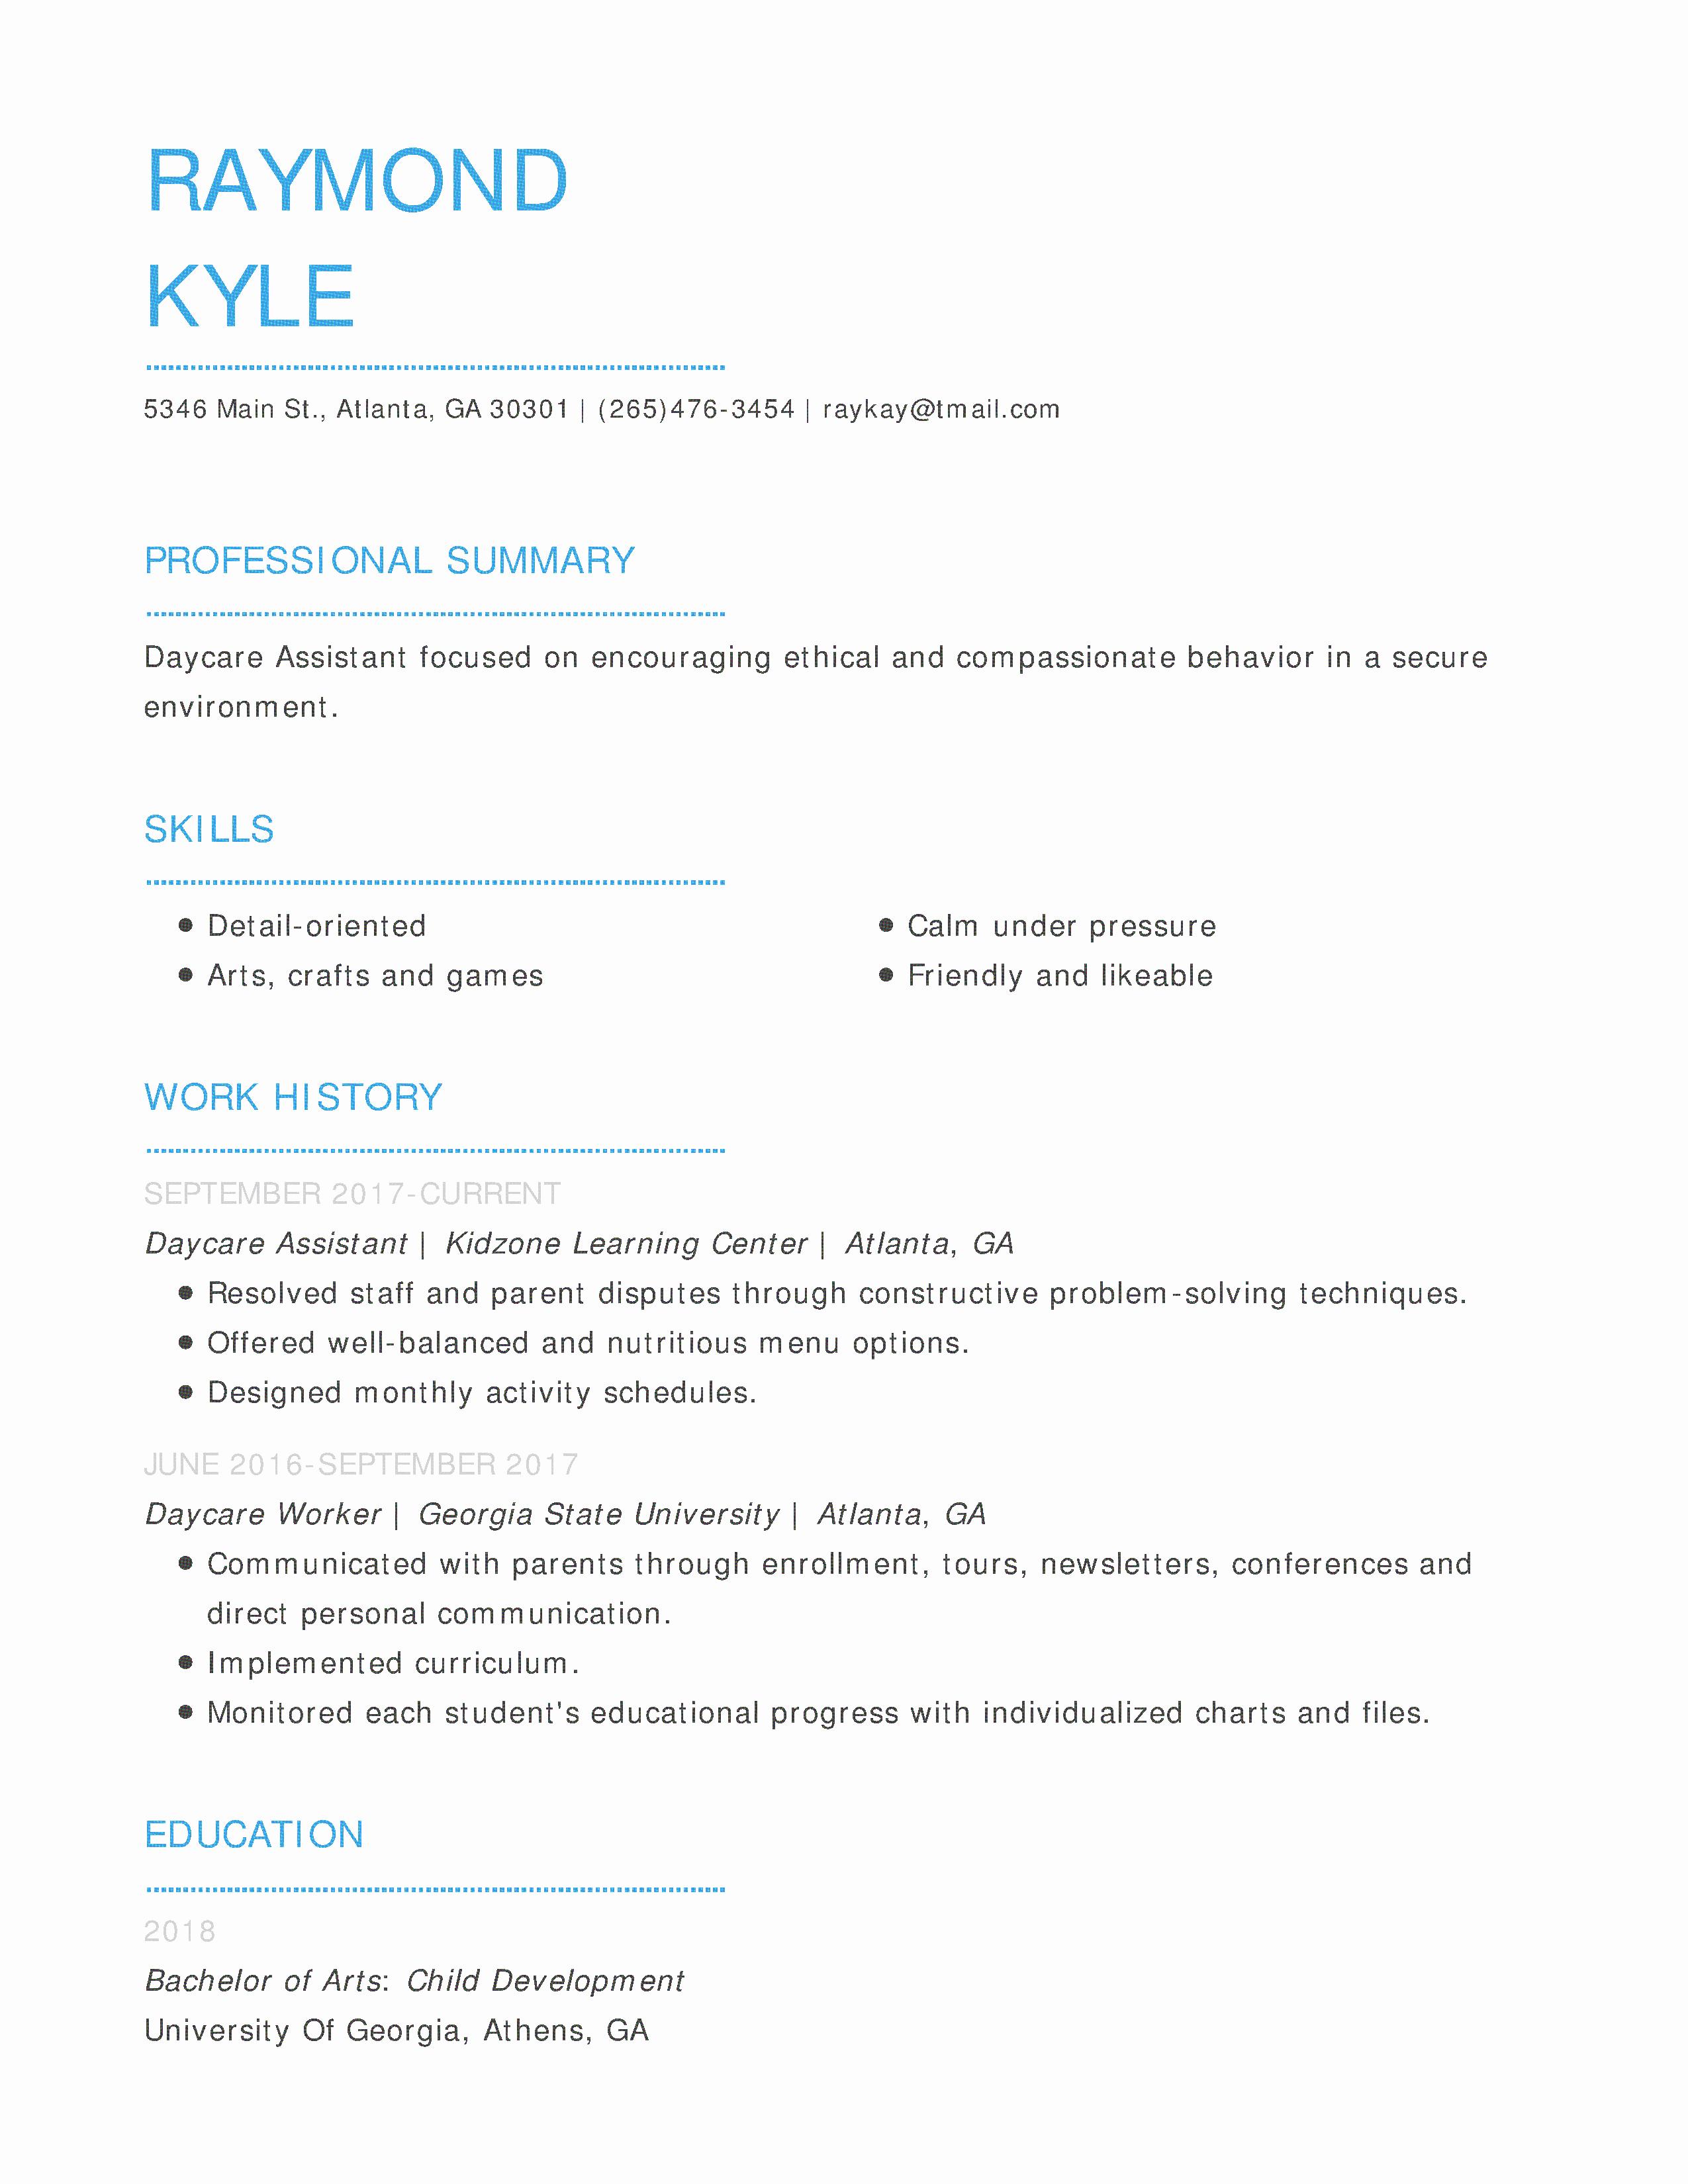 Free Printable Resume Templates New Free Resume Templates Easy to Customize Line Templates